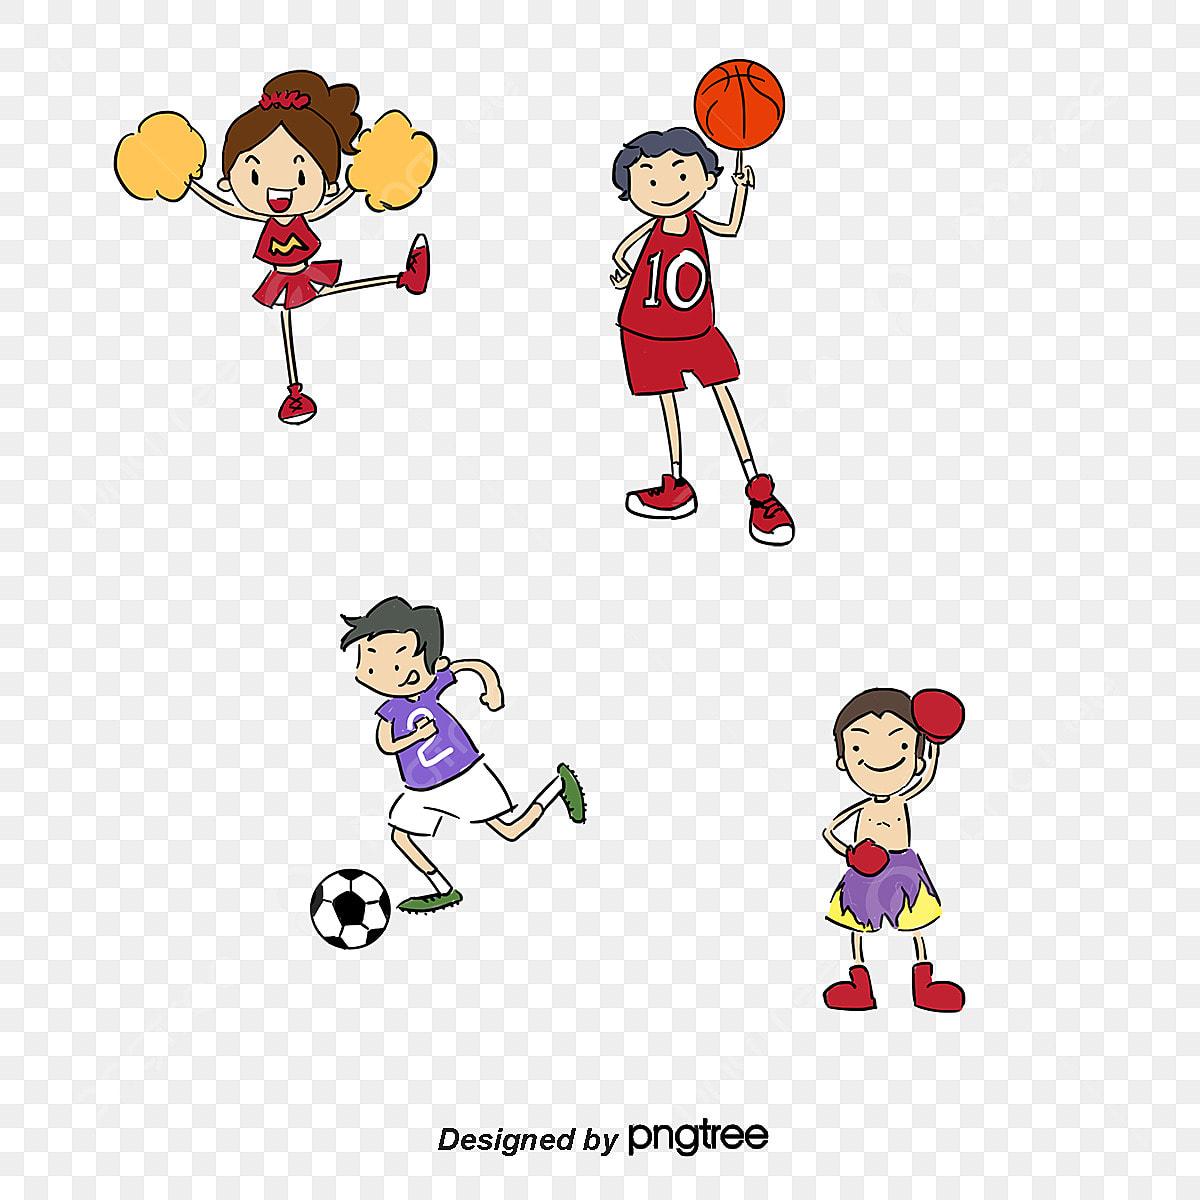 Vector Cartoon Athletes, Cartoon Child, Cartoon Characters, Vector